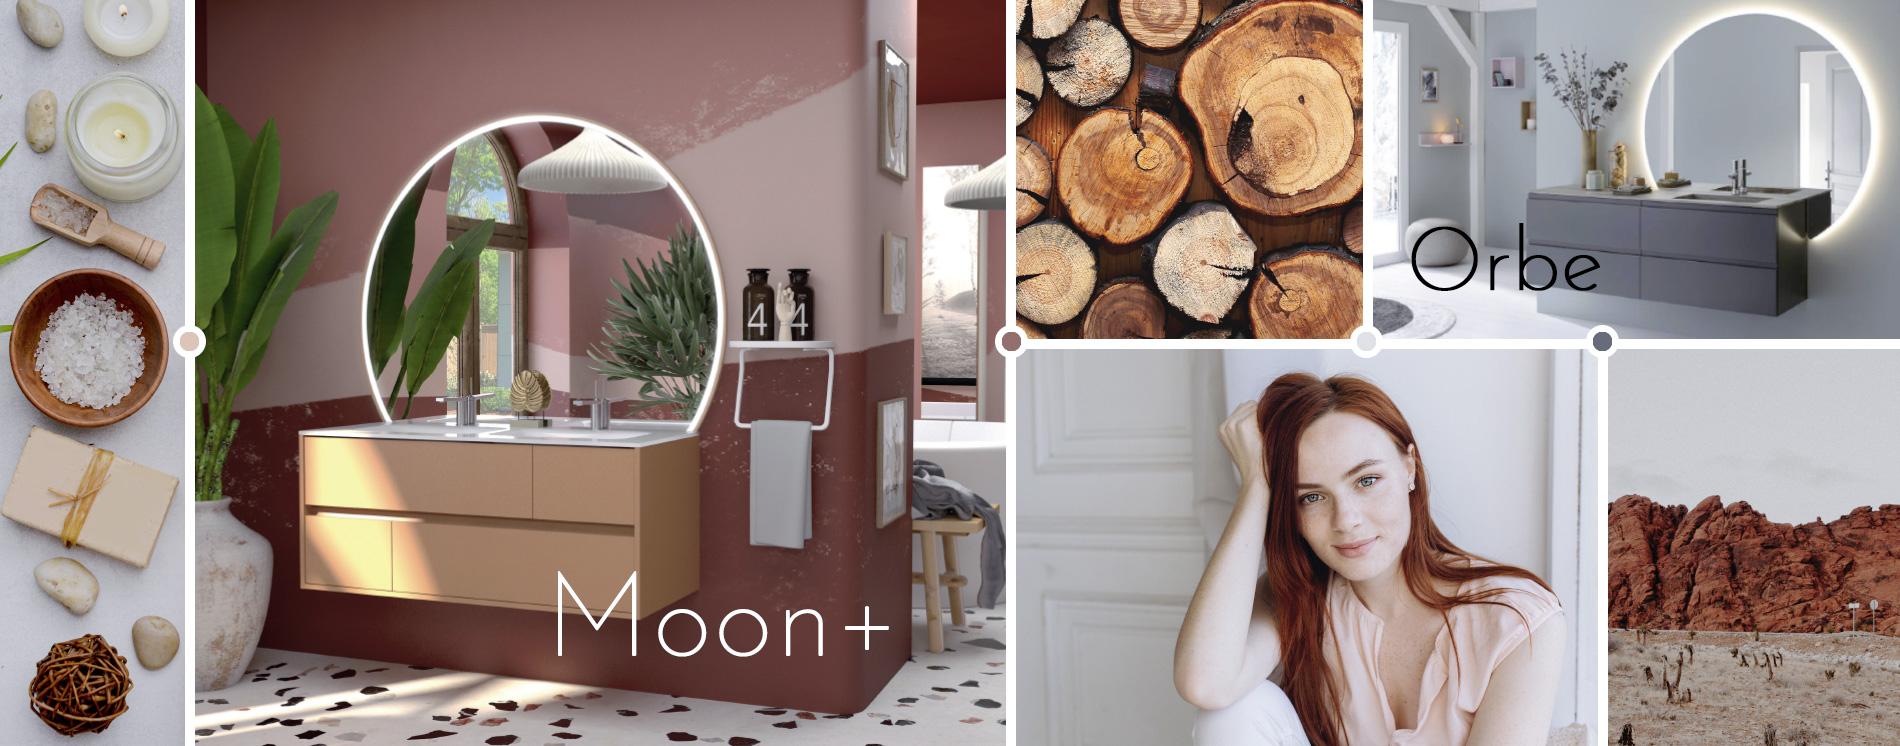 Spiegels Orbe et Moon+